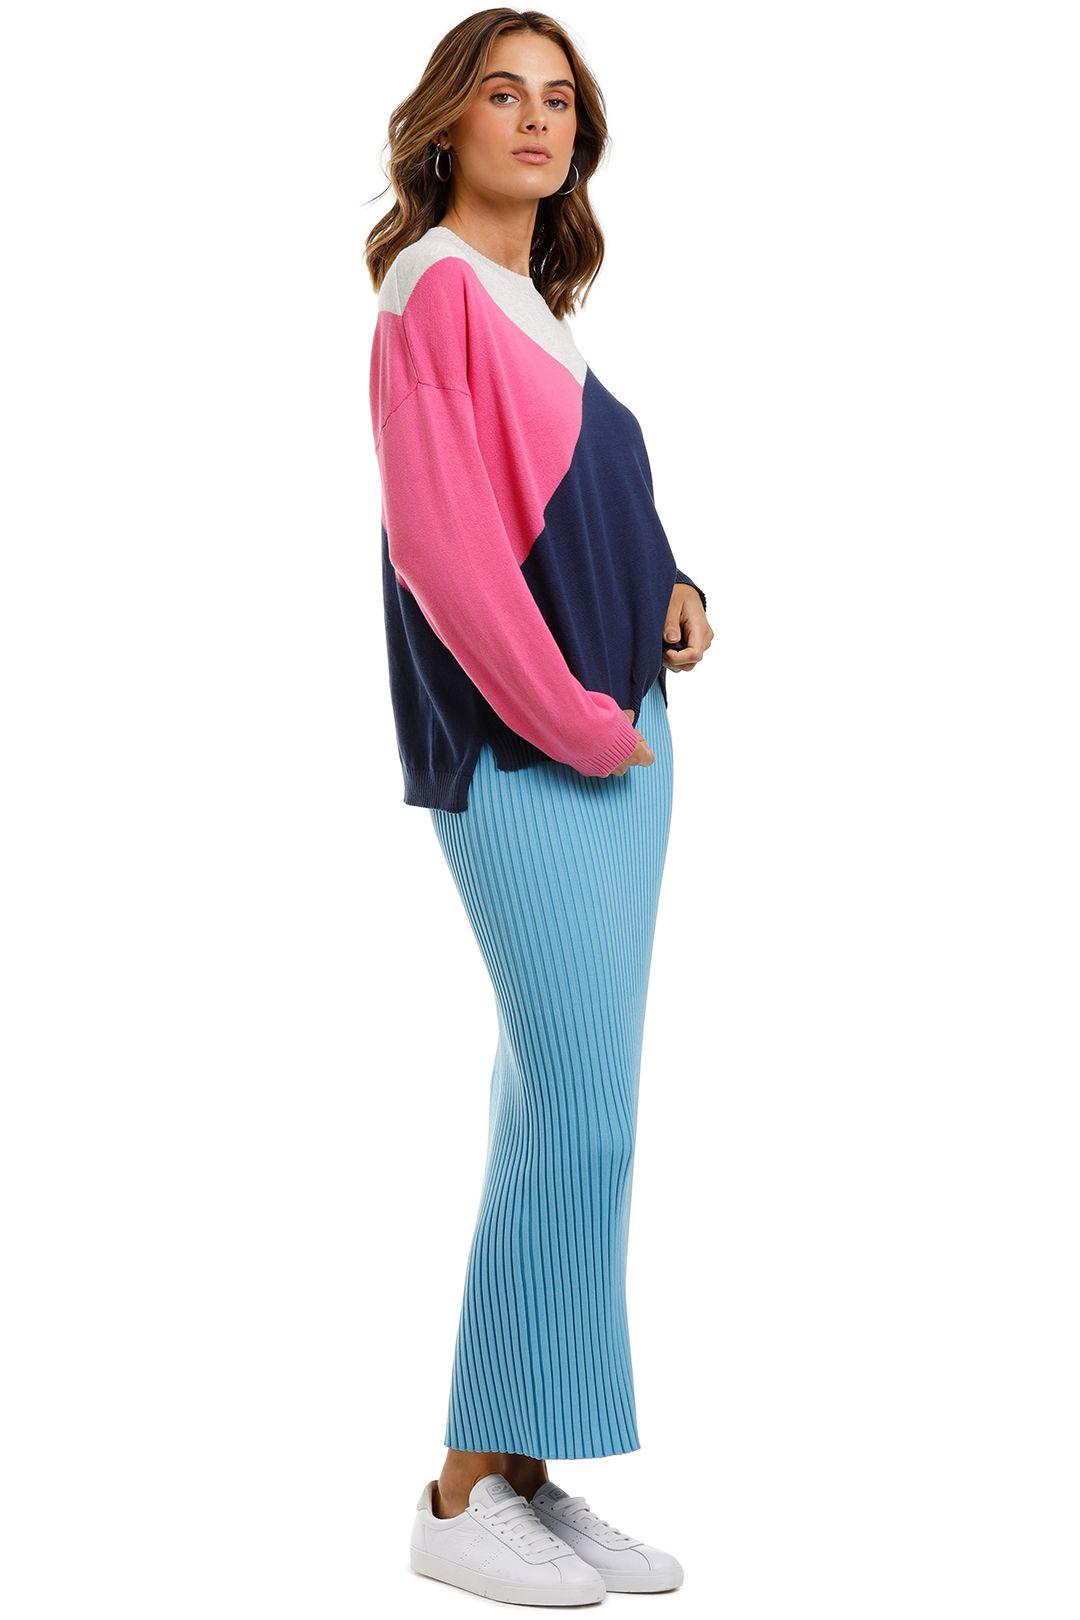 Bande Studio Colour Block Geo Knit Pink